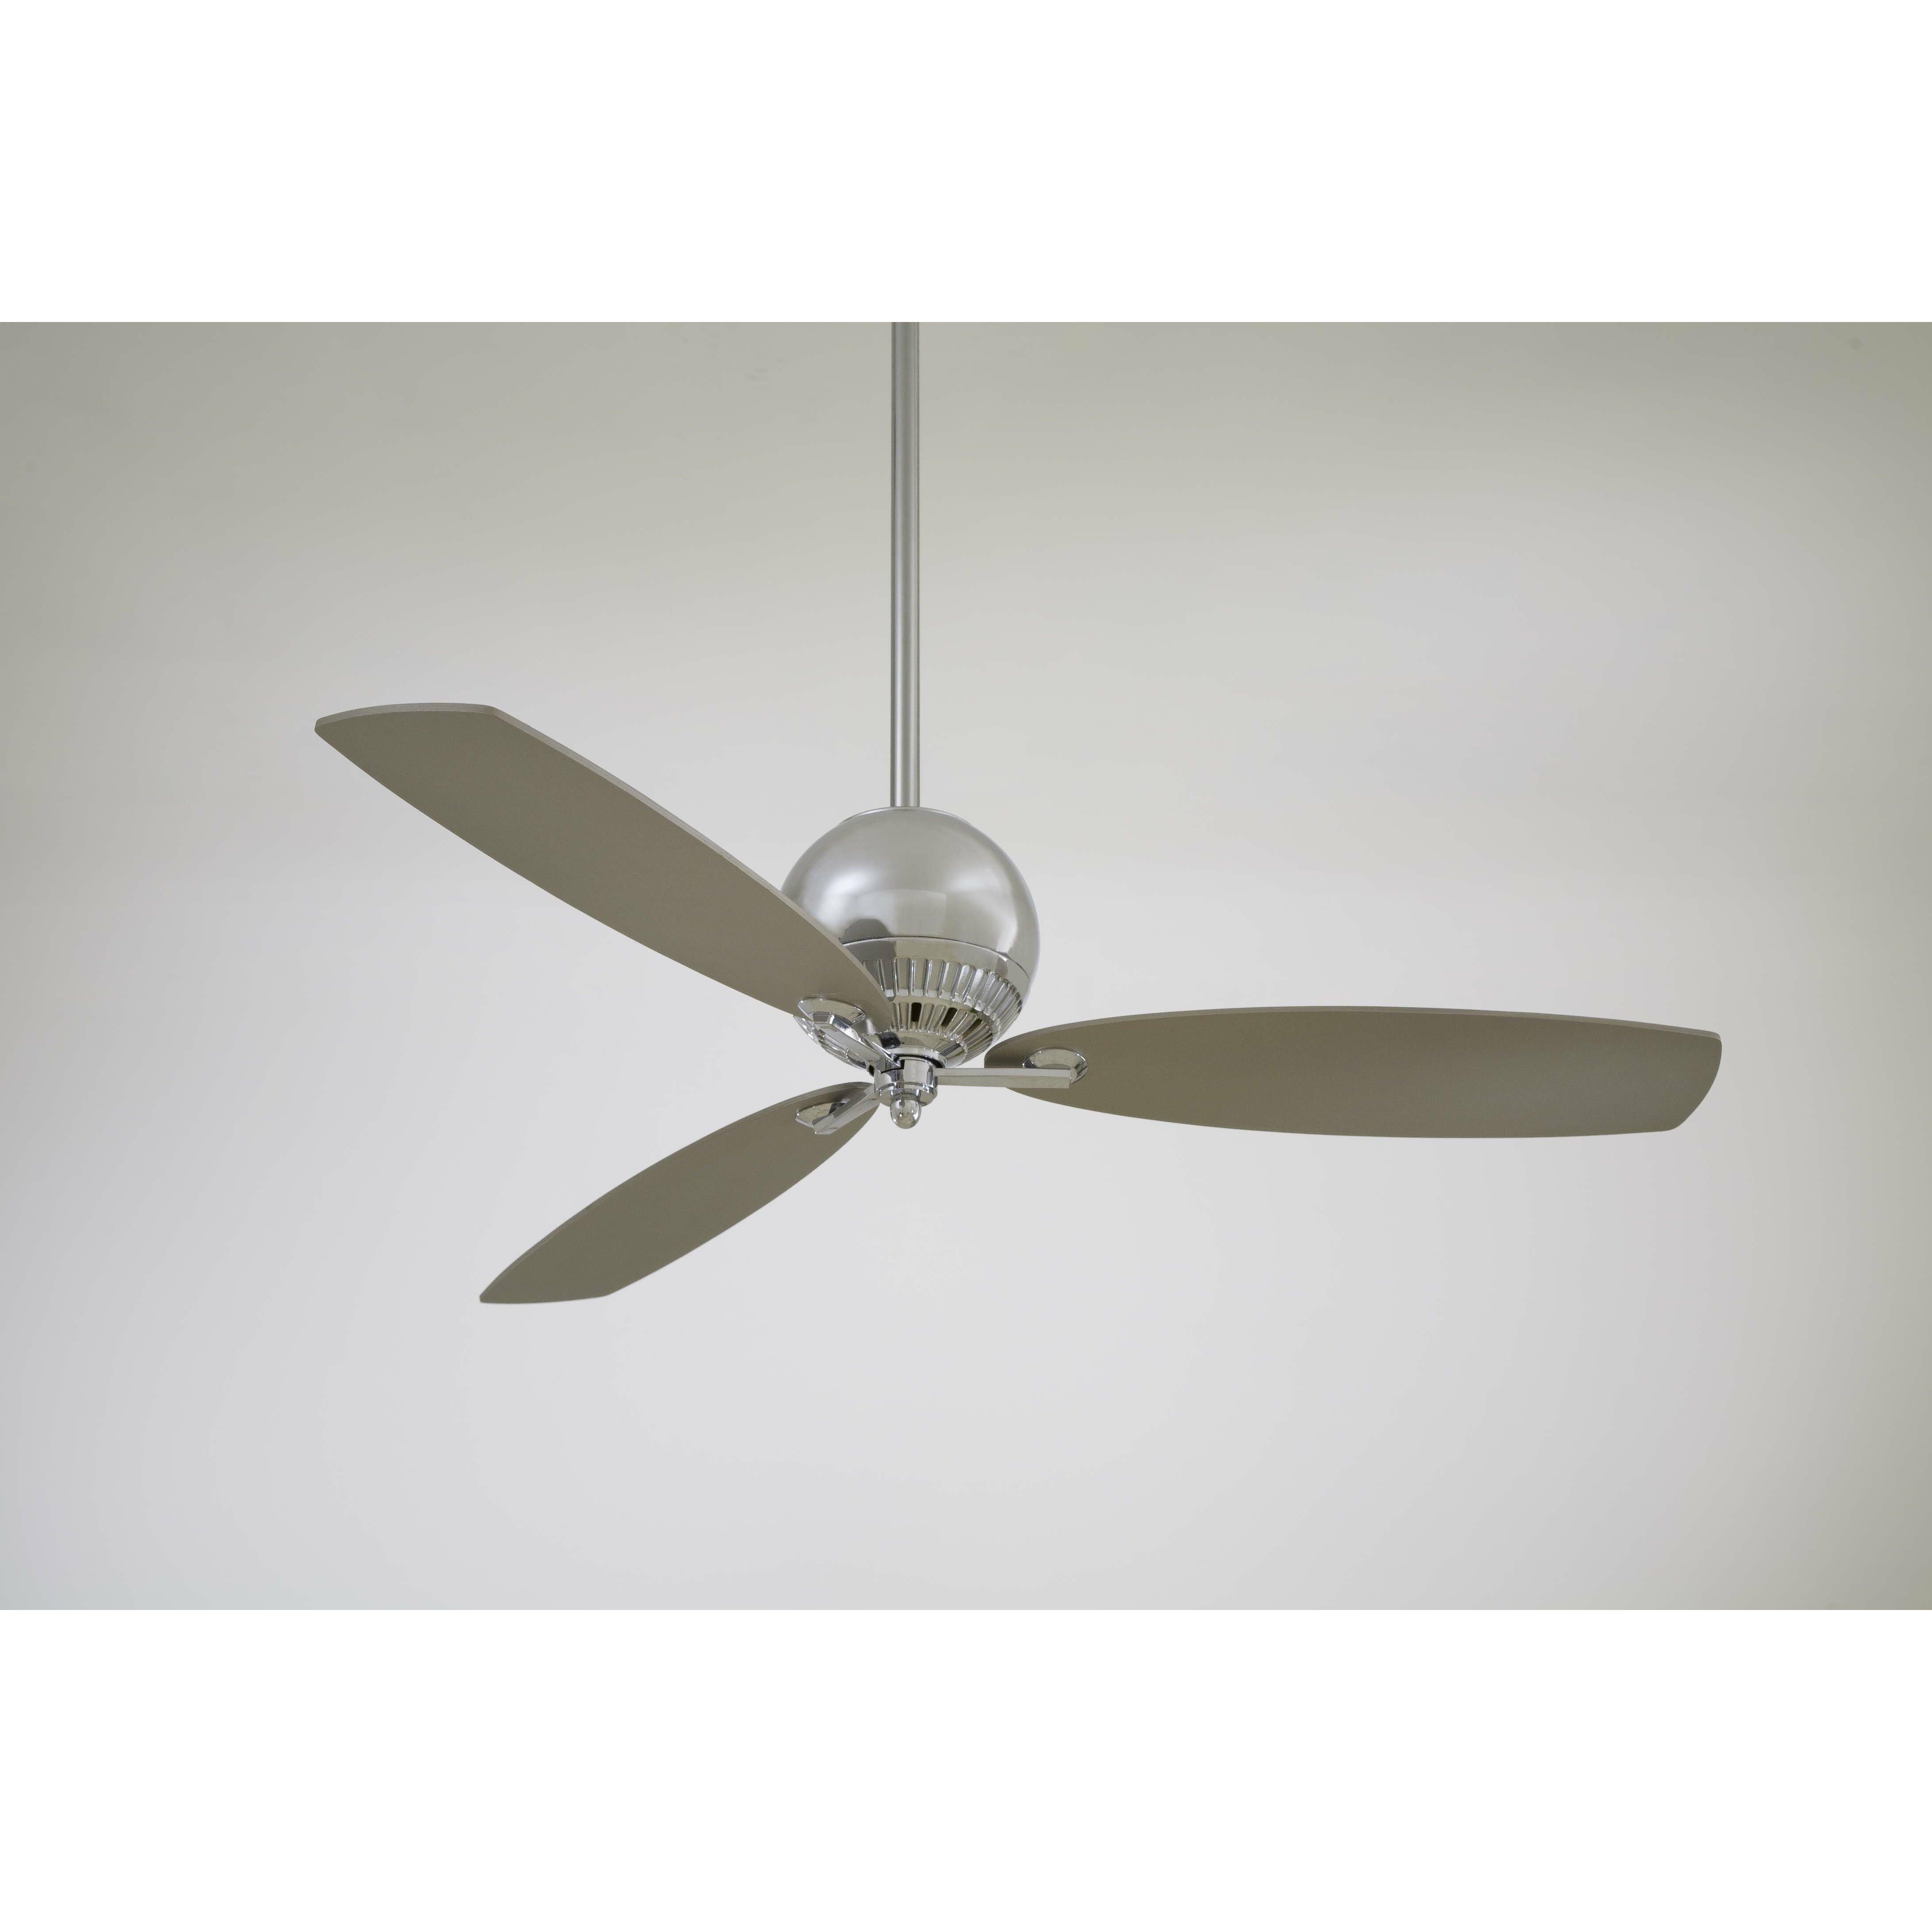 "Ceiling Fan Minka Aire: Minka Aire 36"" Ceiling Fan Downrod & Reviews"